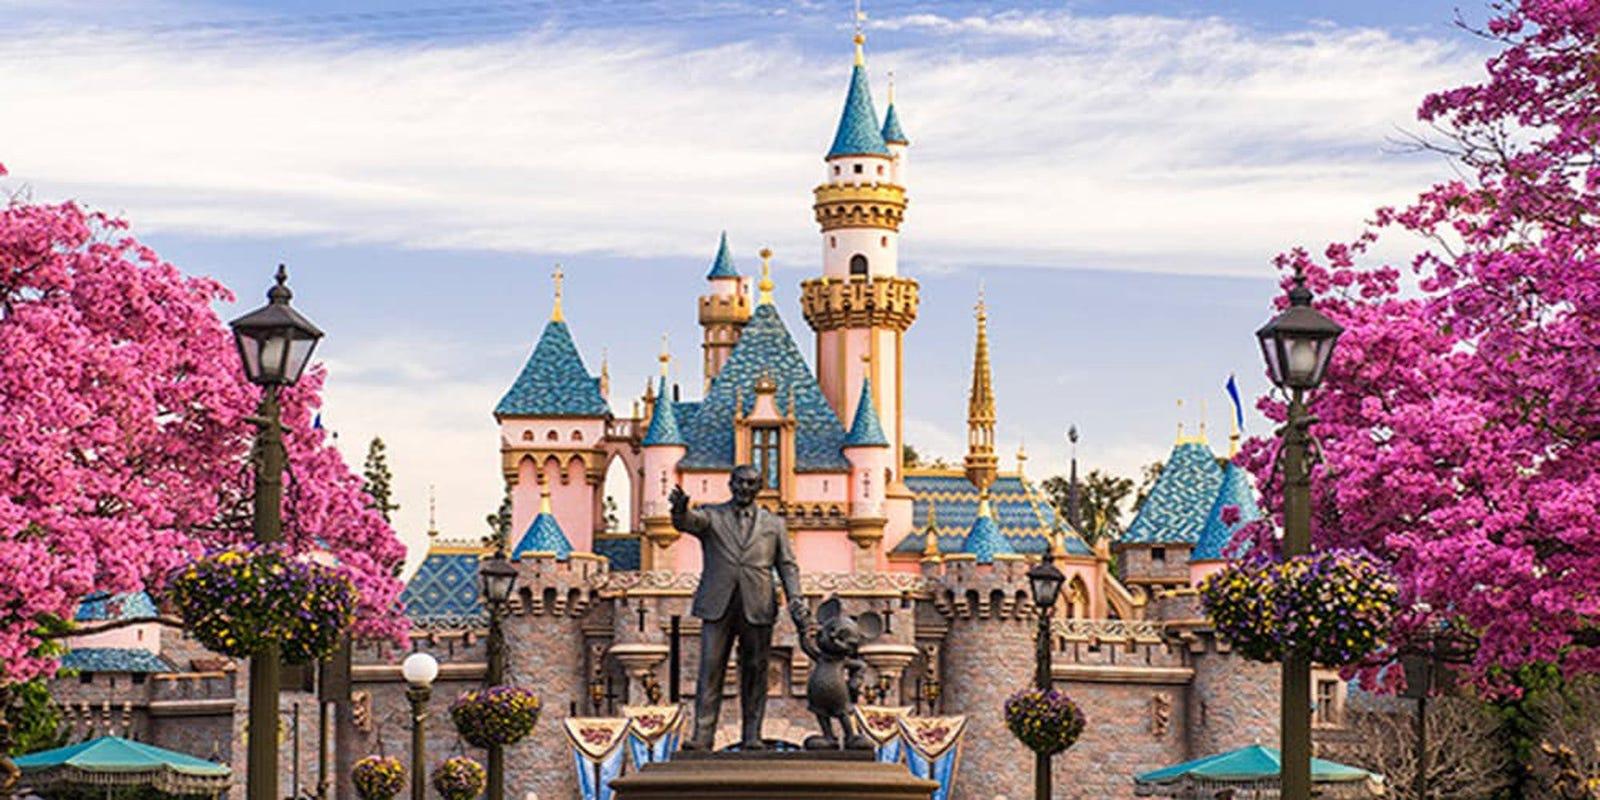 Walt Disney World sets July 11 reopening date for Magic Kingdom, Animal Kingdom